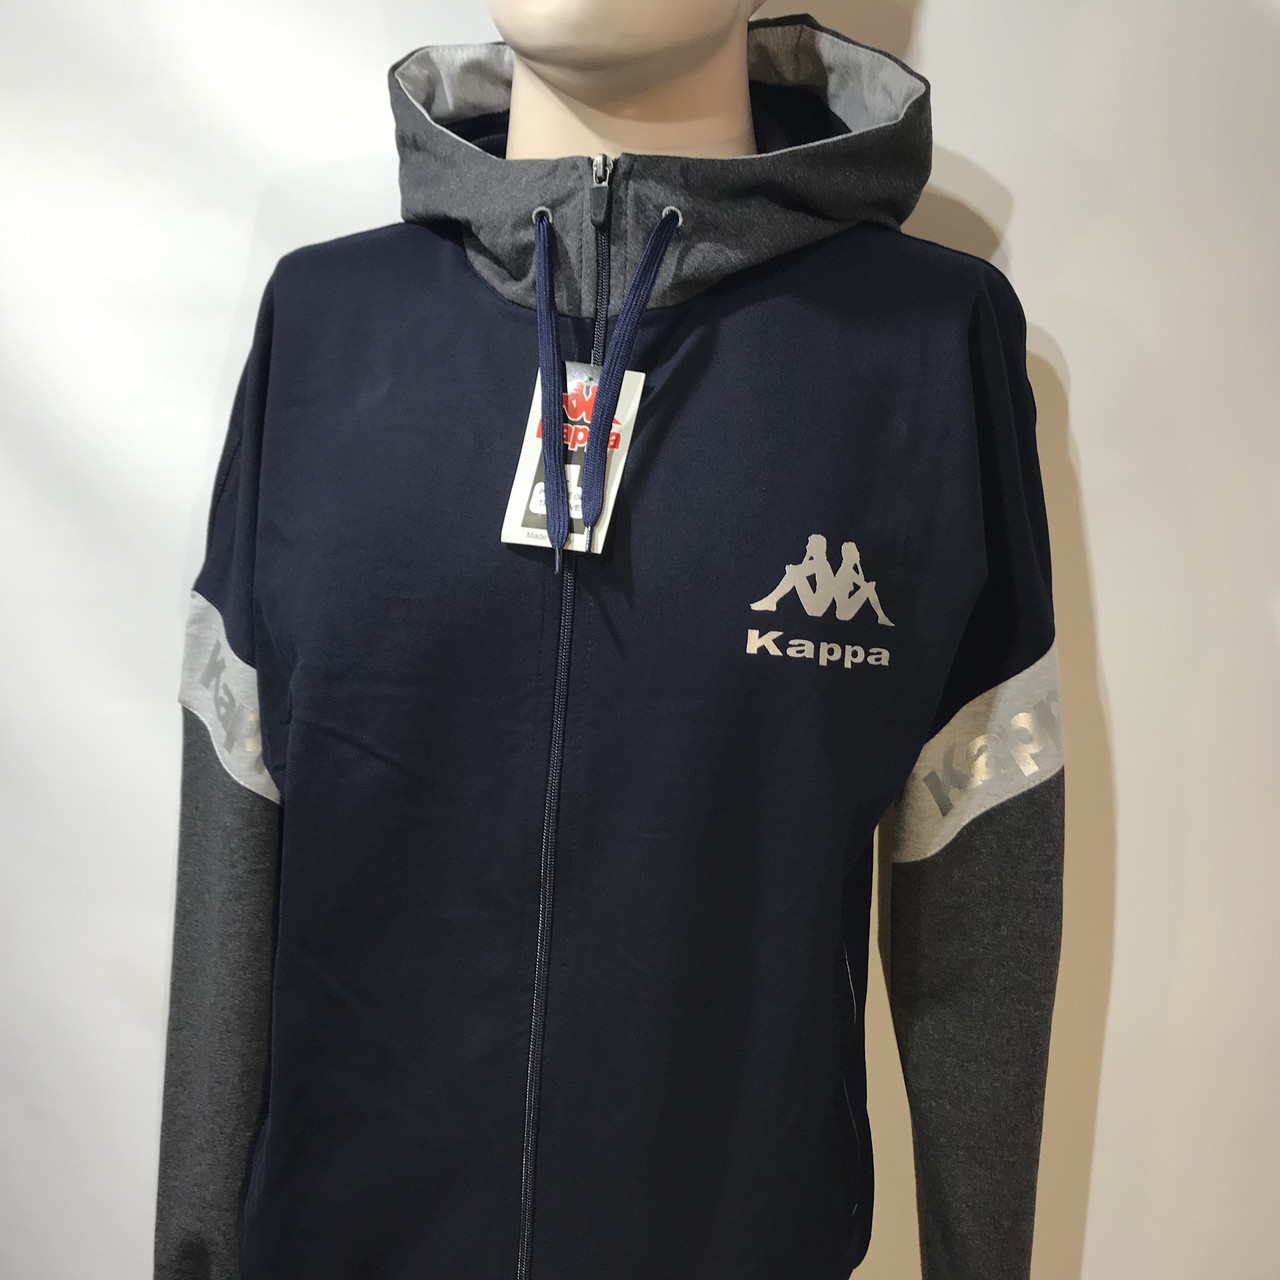 Мужской спортивный костюм Карра Каппа темно- синий